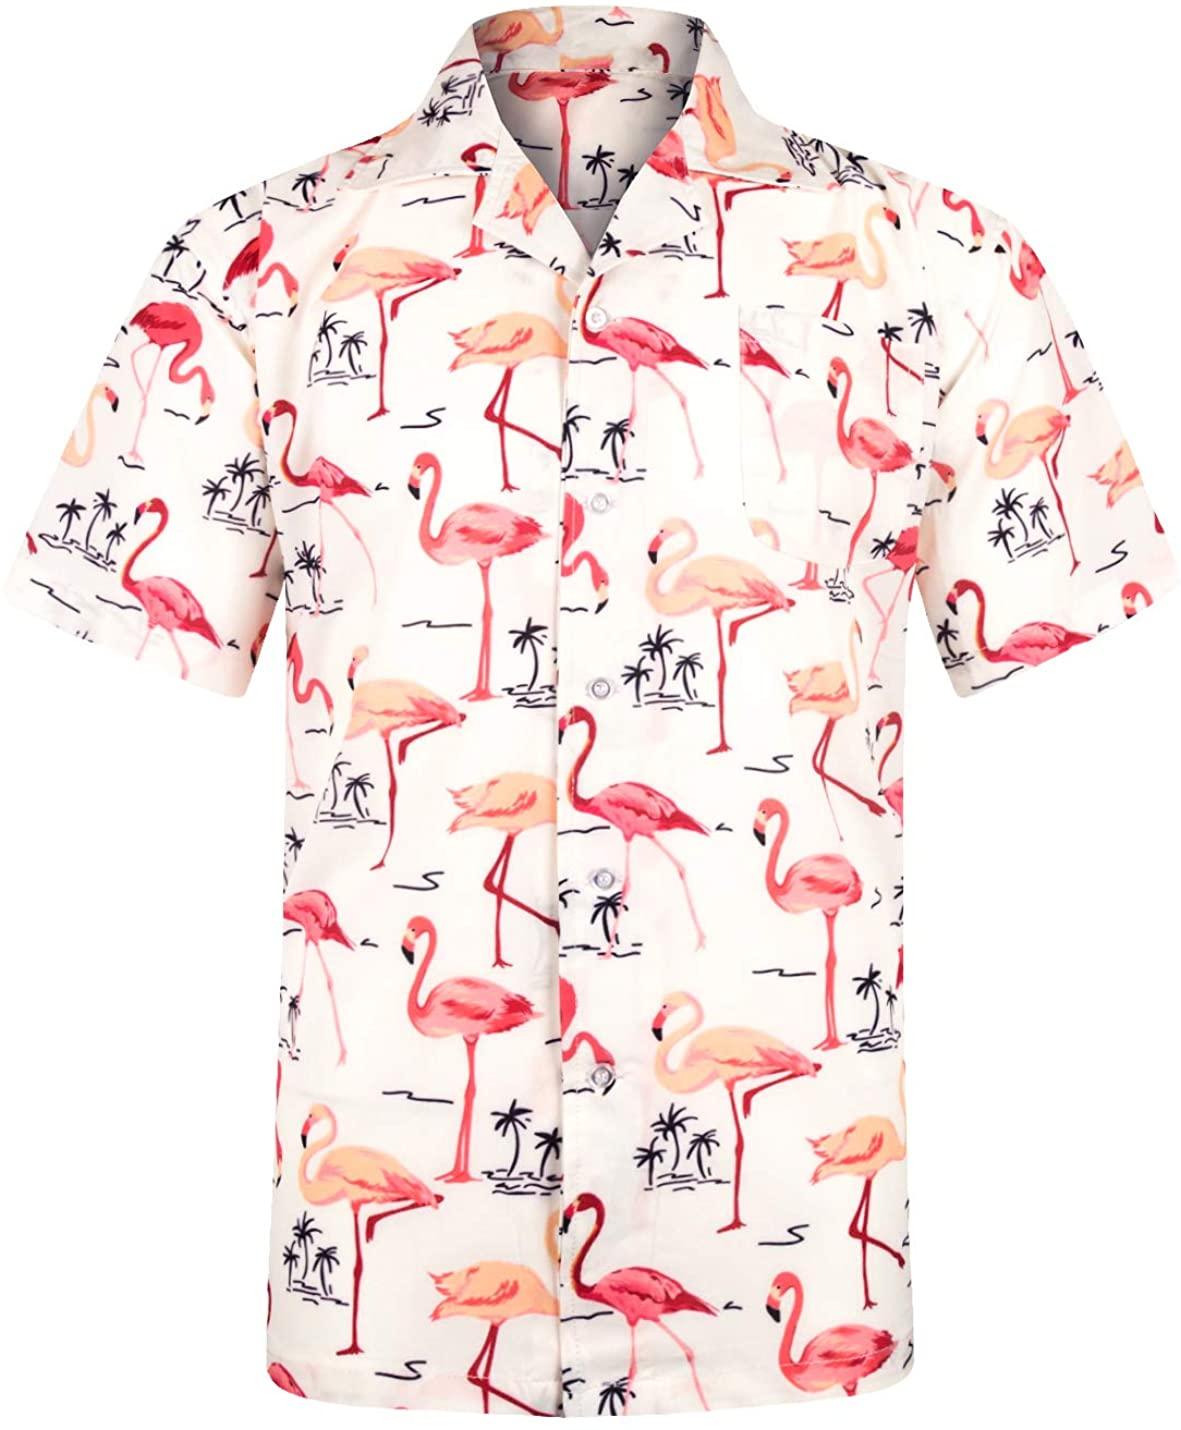 ZHPUAT Men's Funky Hawaiian Shirt Short Sleeve Button Down Tropical Print Shirts Beach Party Holiday